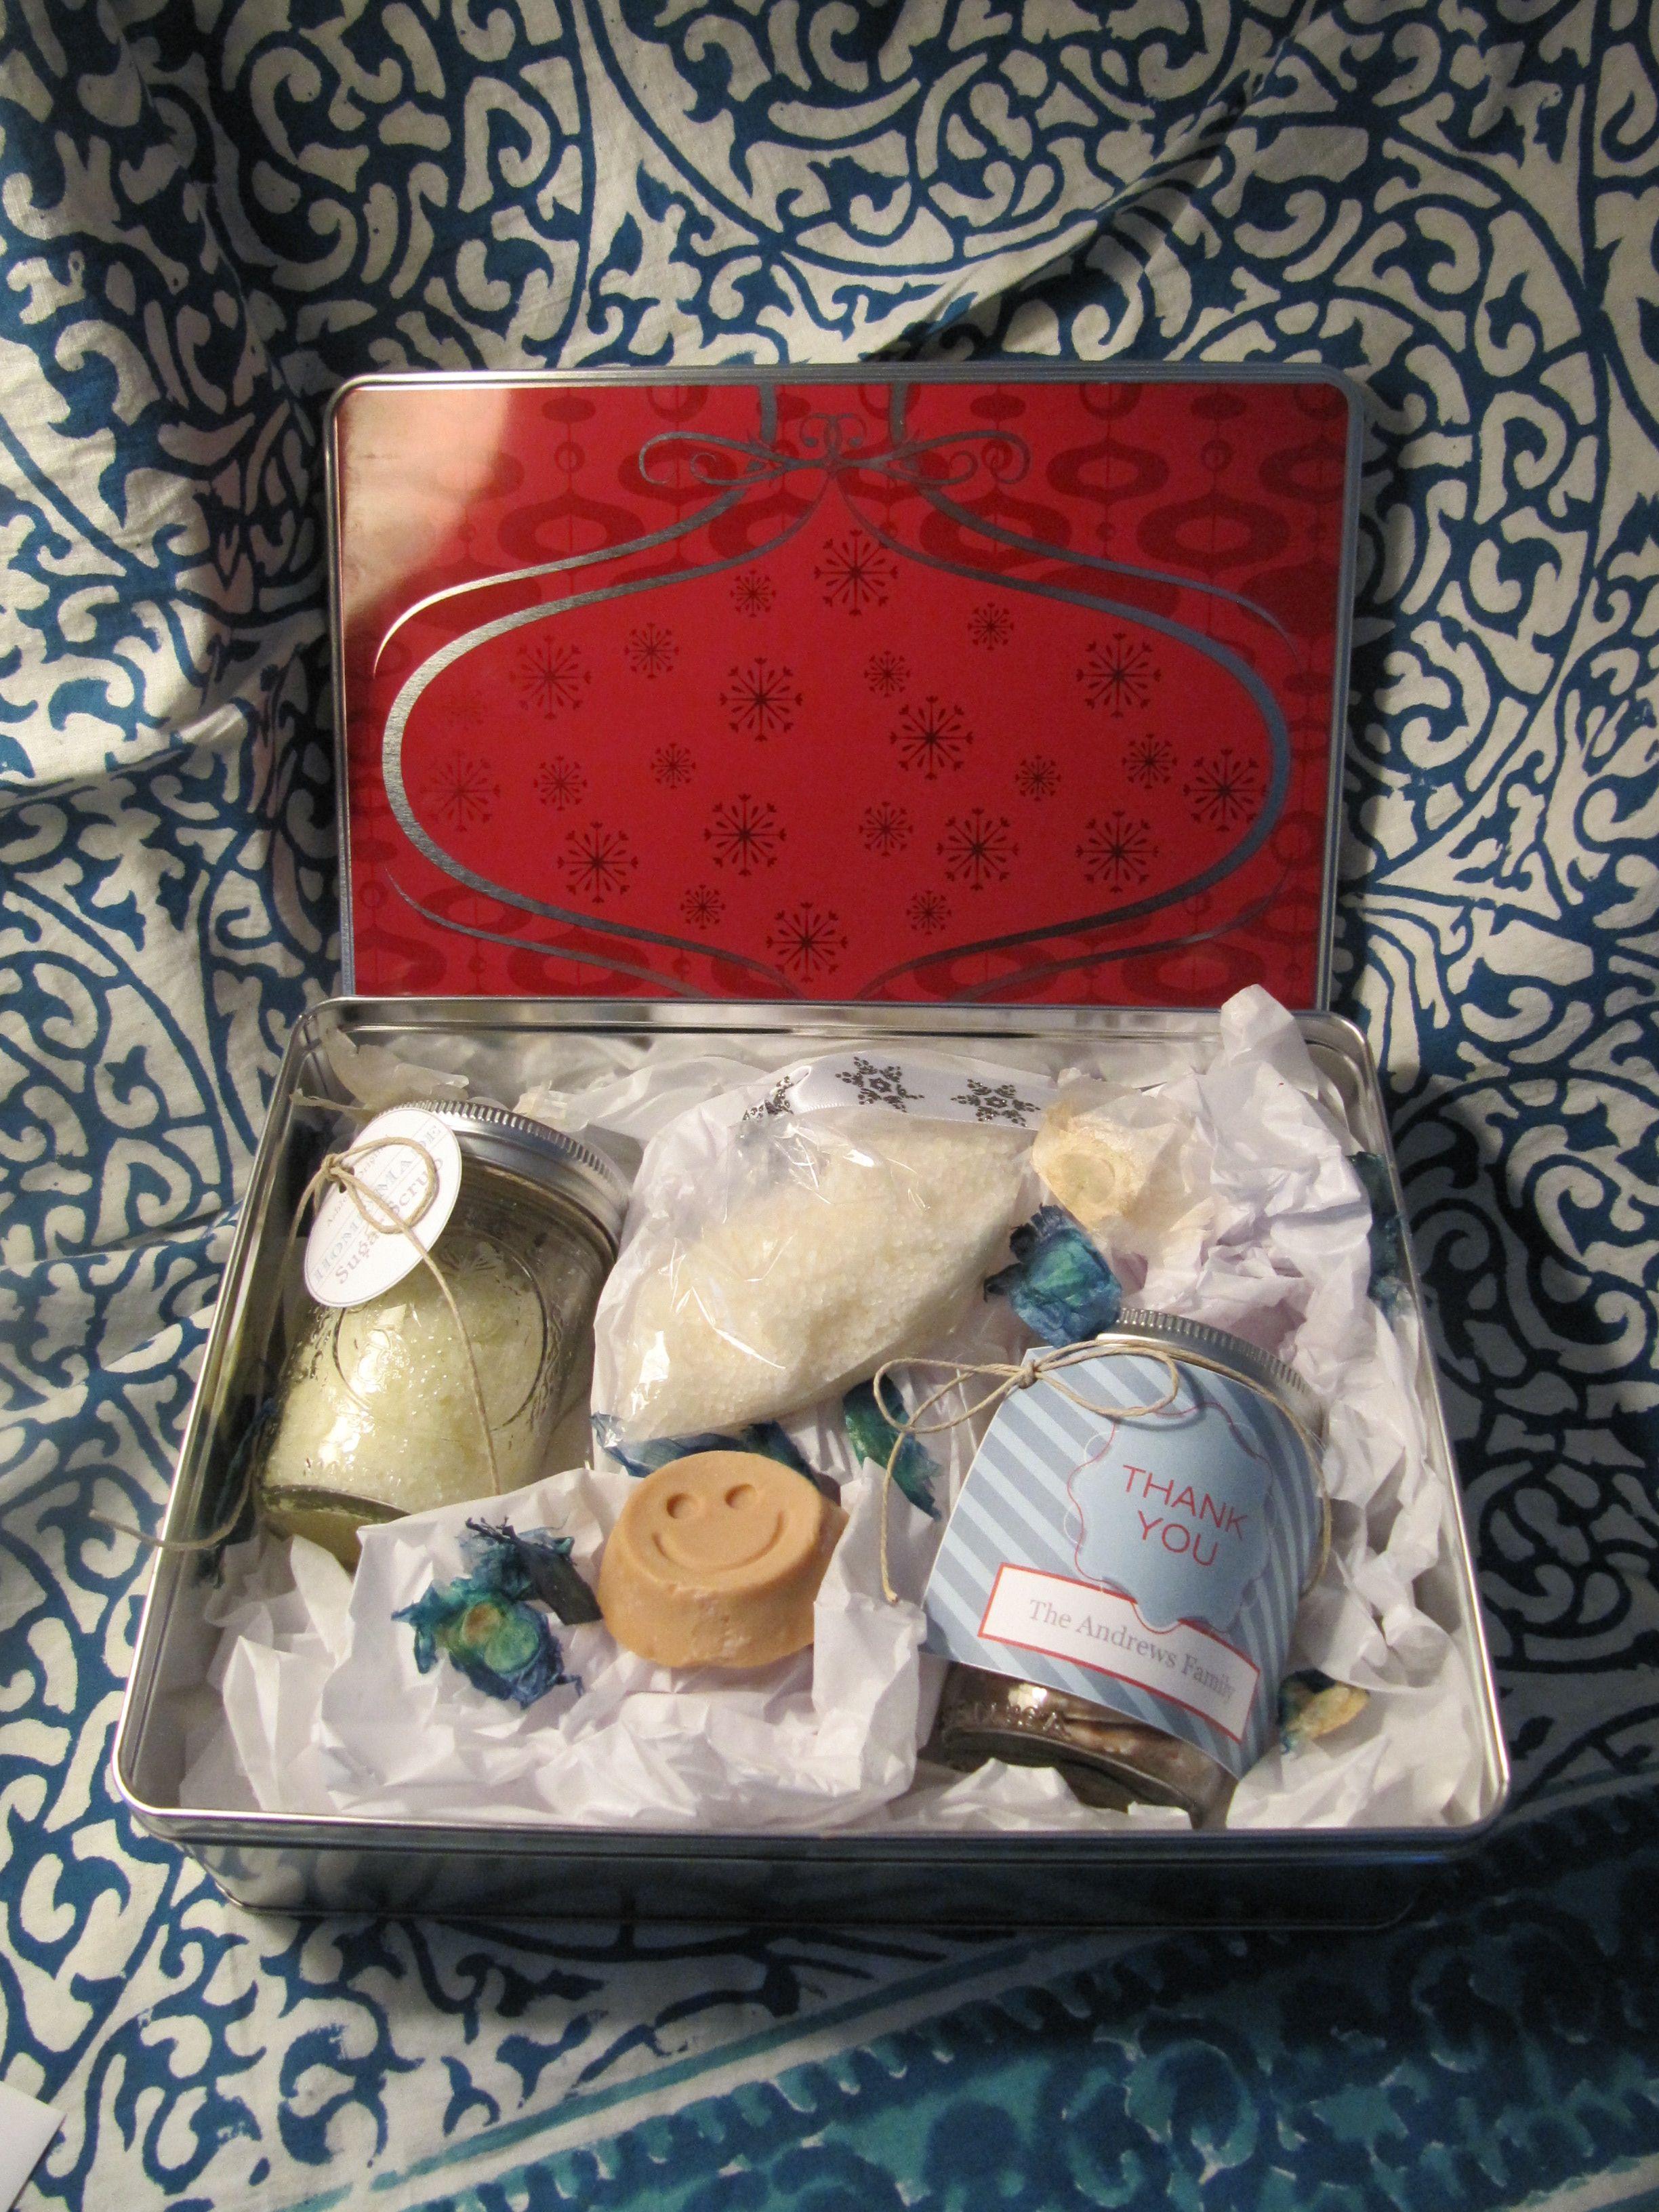 A sweet n salty gift basket for my secret santa sugar